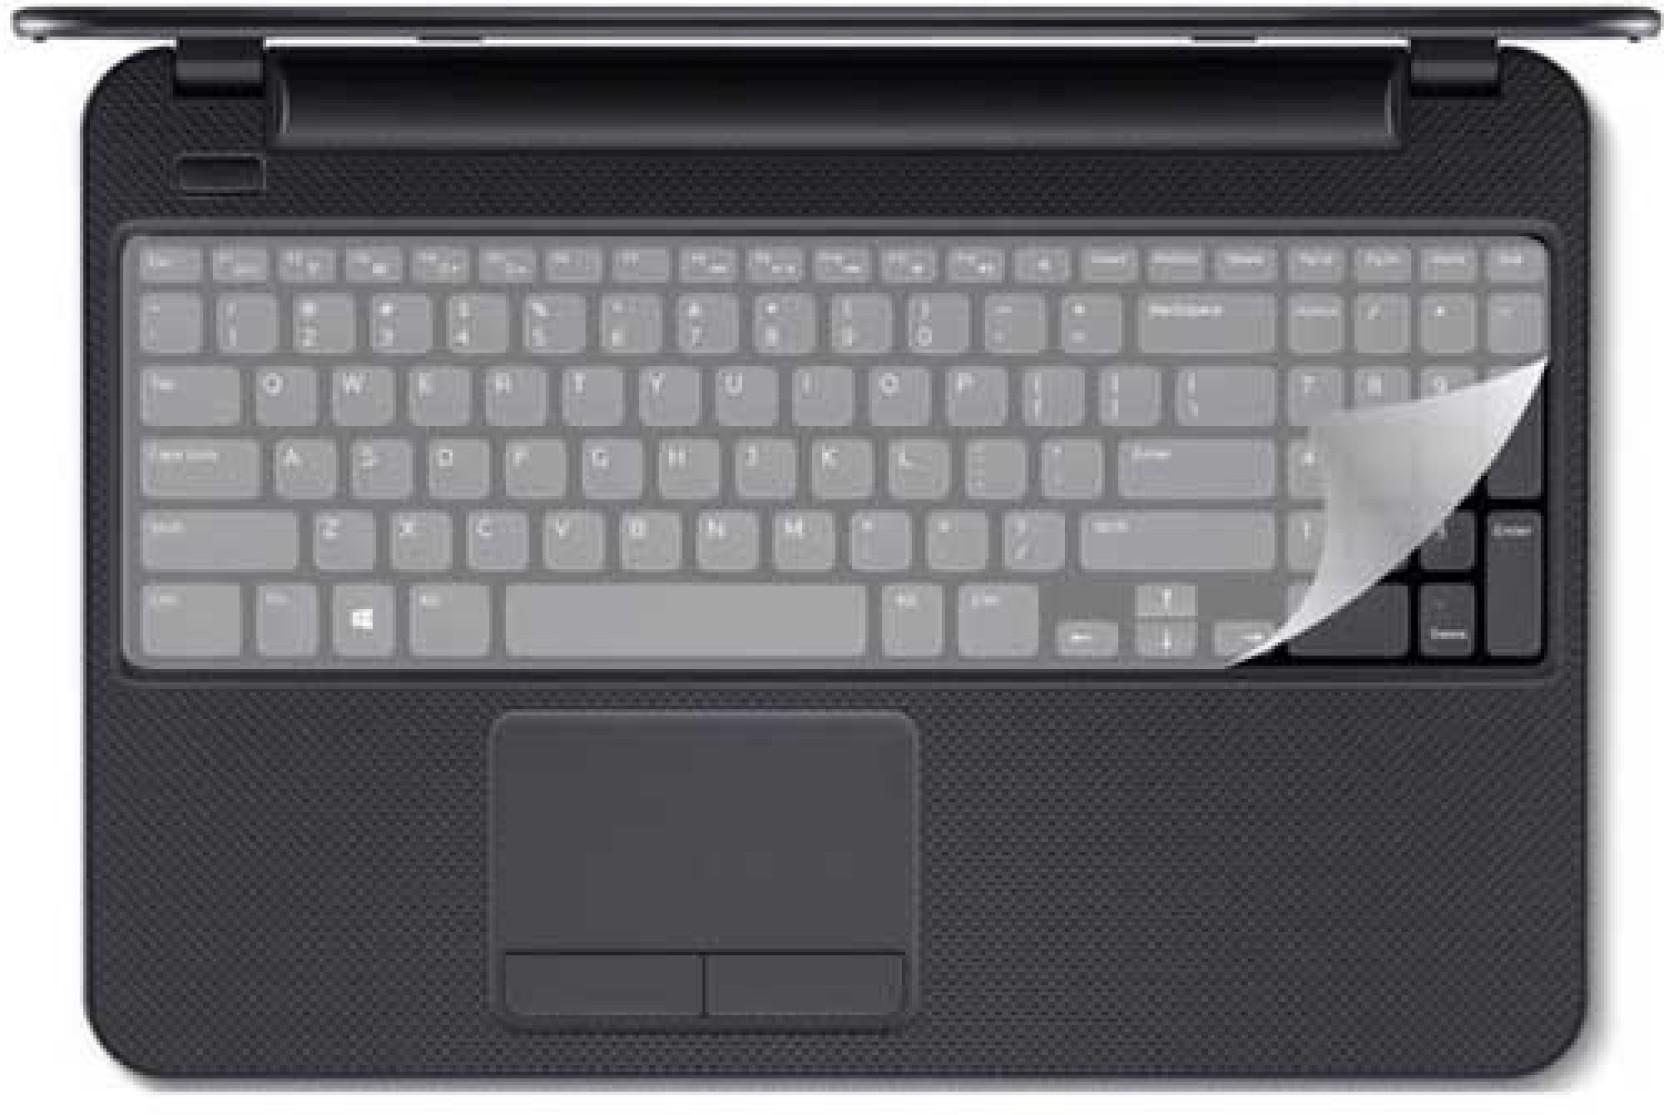 Ranz Rkg15 Lenovo G50 80 Keyboard Skin Price In India Buy Laptop Ideapad G40 30 45 70 75 Add To Cart